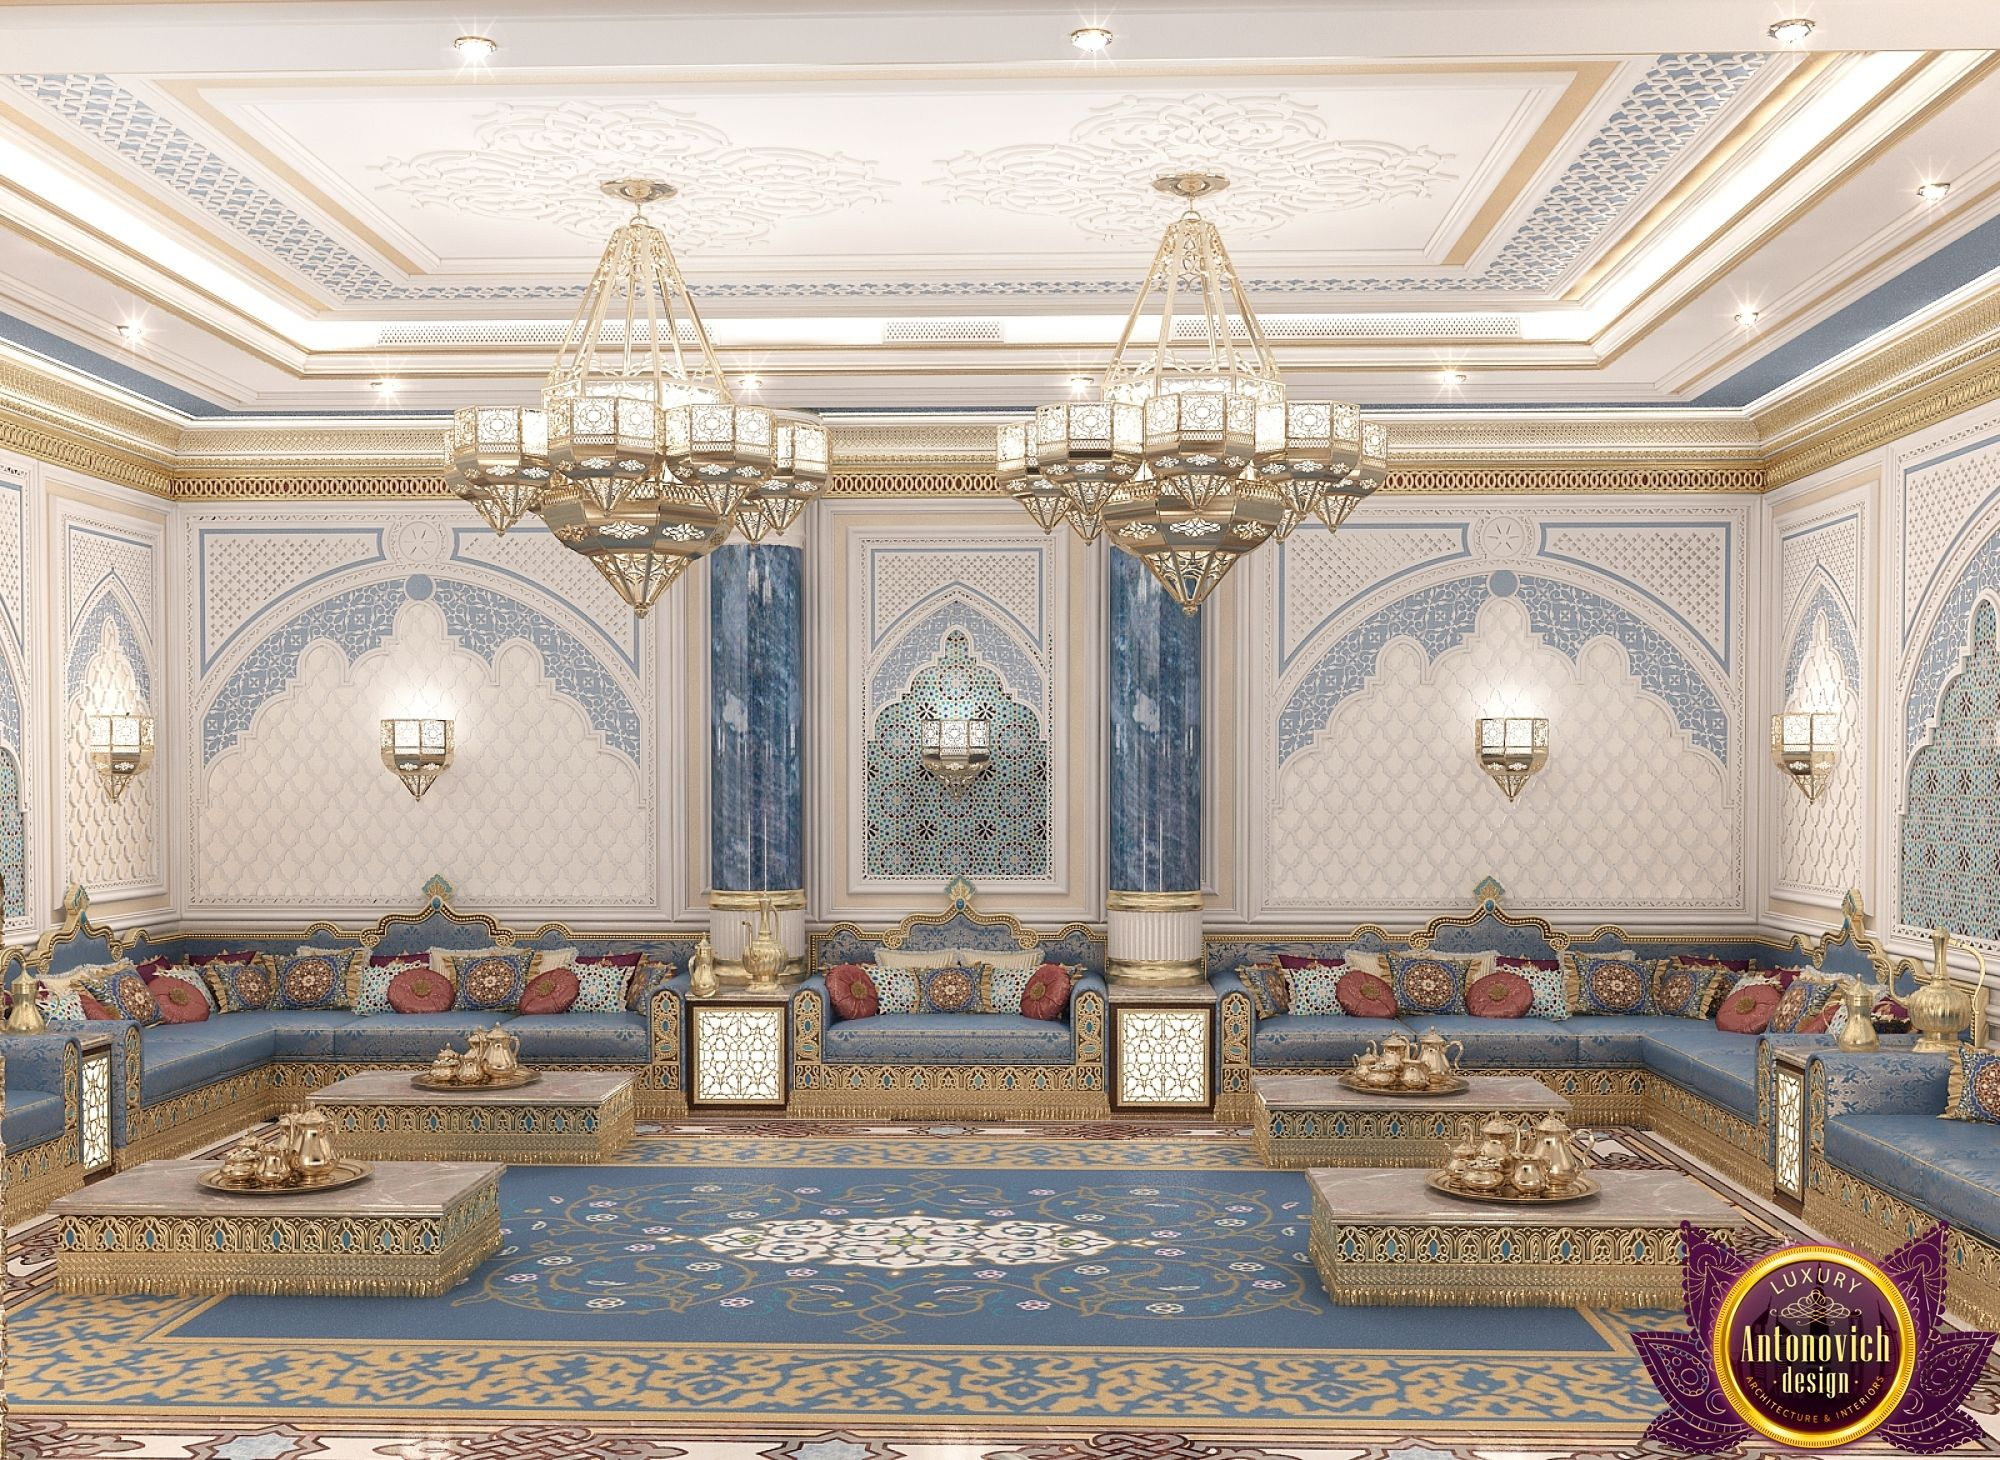 Ar Antonovich Design Ae Our Works Majlis Interior Design Luxury Arabic Majlis Html Luxury Interior Design Arabian Decor Luxury Interior